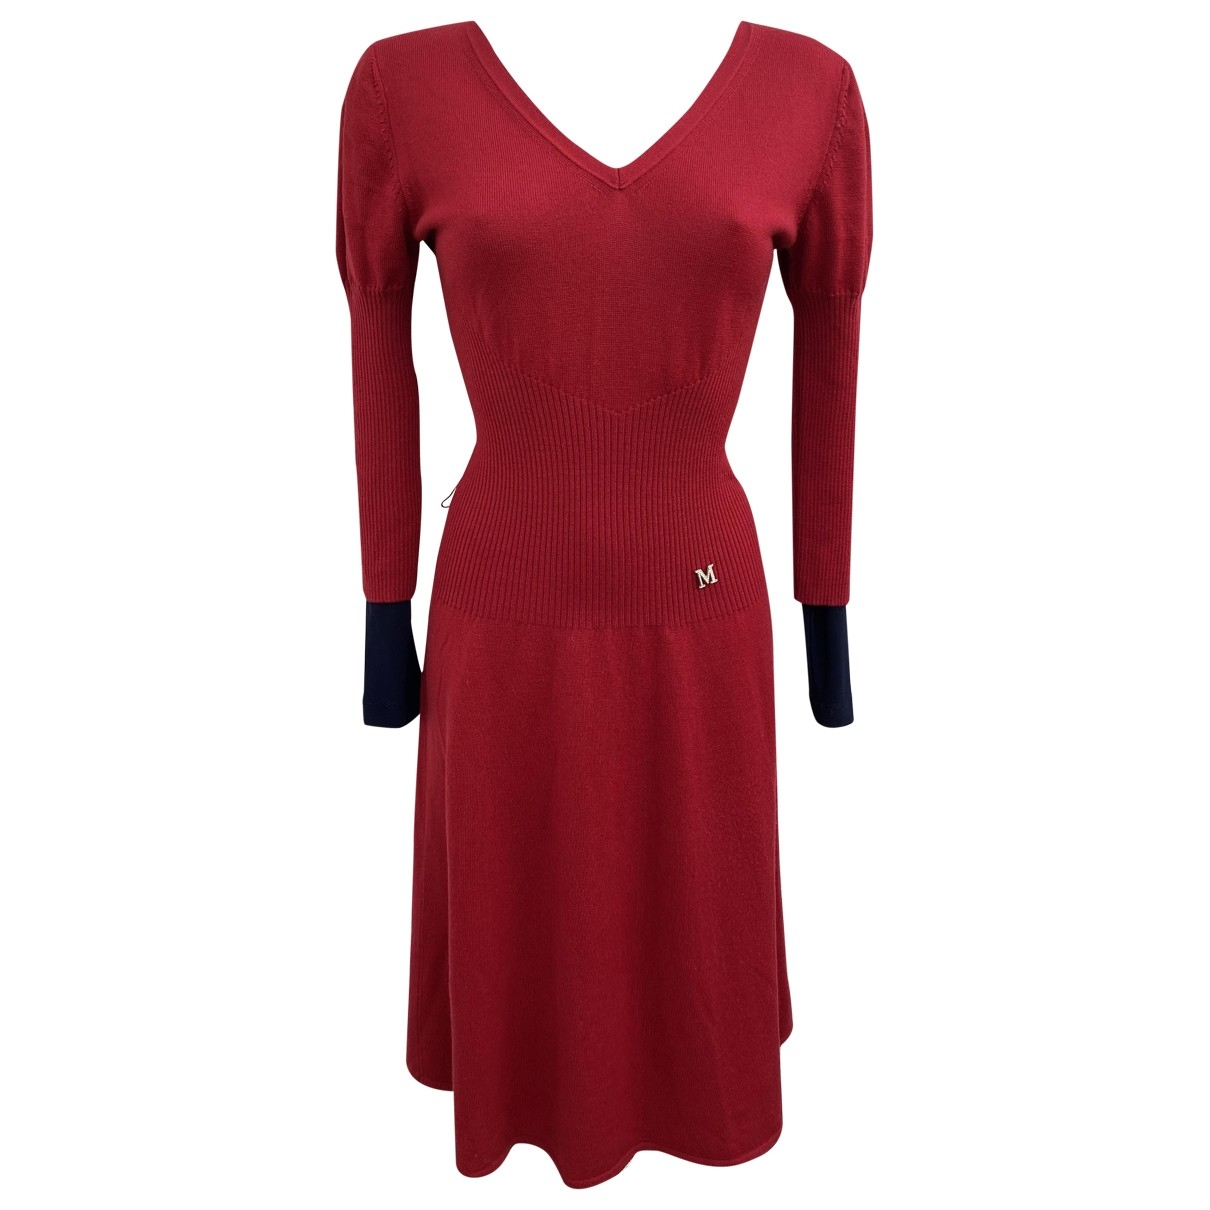 Max Mara Max Mara Atelier Red Wool dress for Women M International